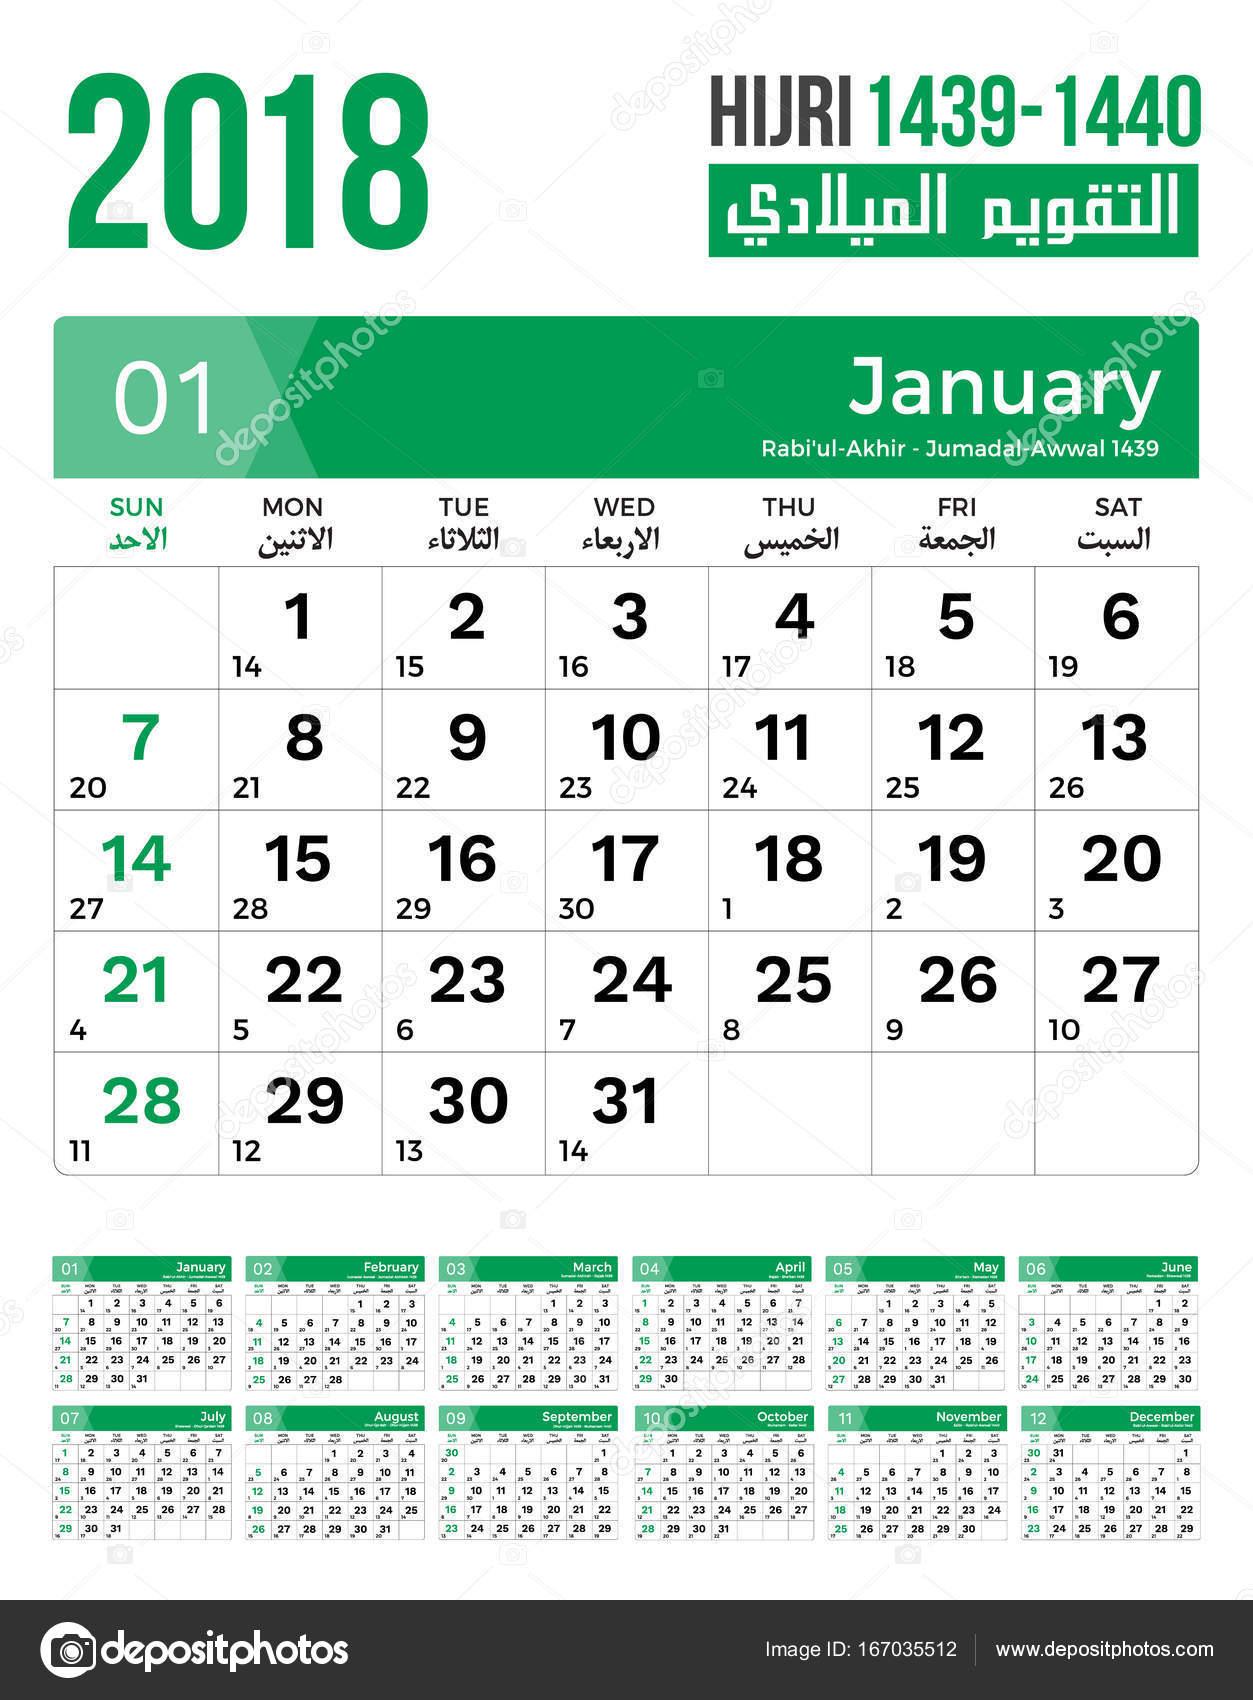 2018 islamic hijri calendar template design version 6 stock vector